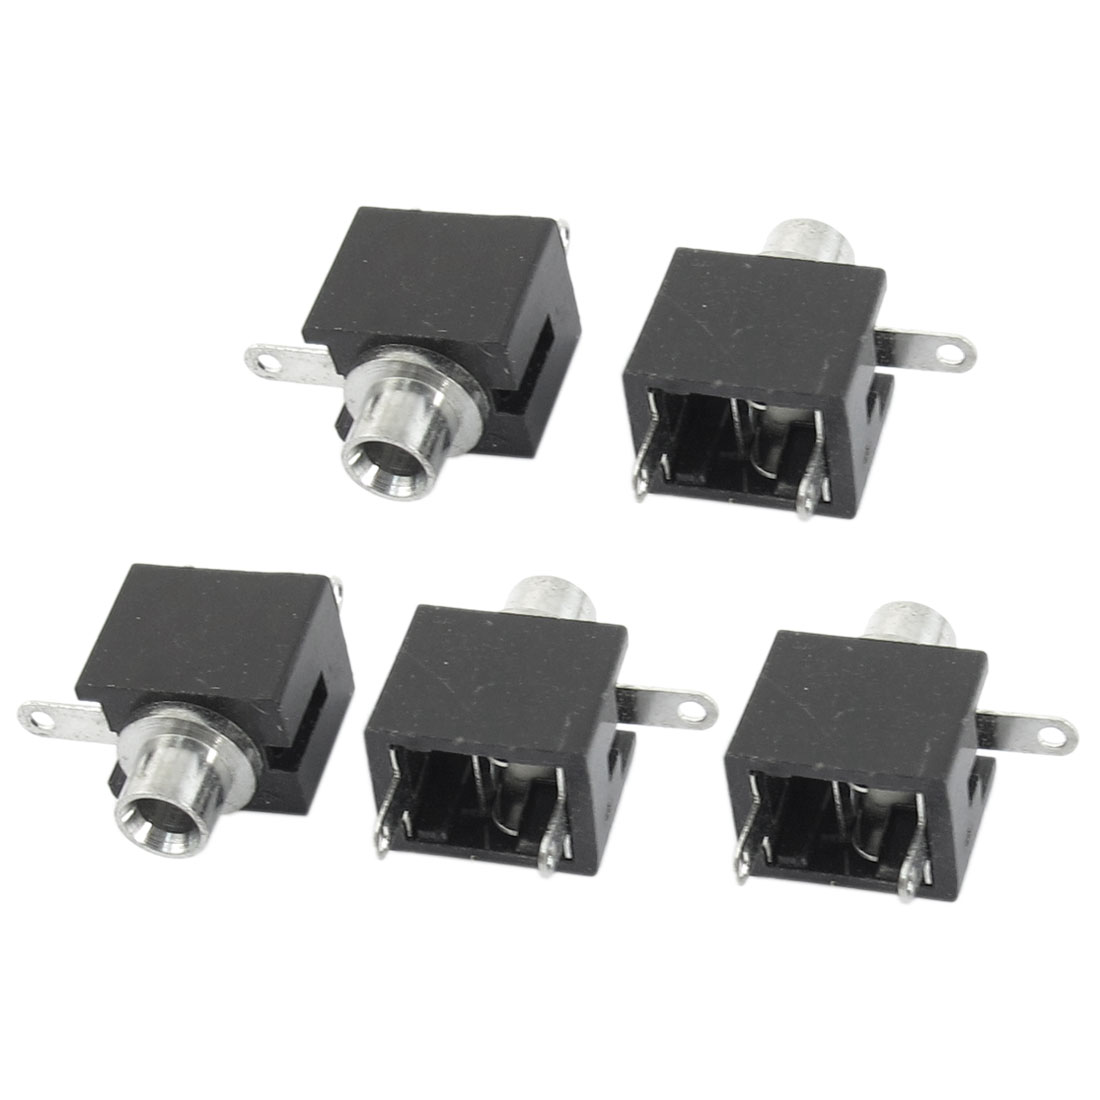 5pcs 3 5mm mono female socket audio jack soldering pcb panel mount5pcs 3 5mm mono female [ 1100 x 1100 Pixel ]